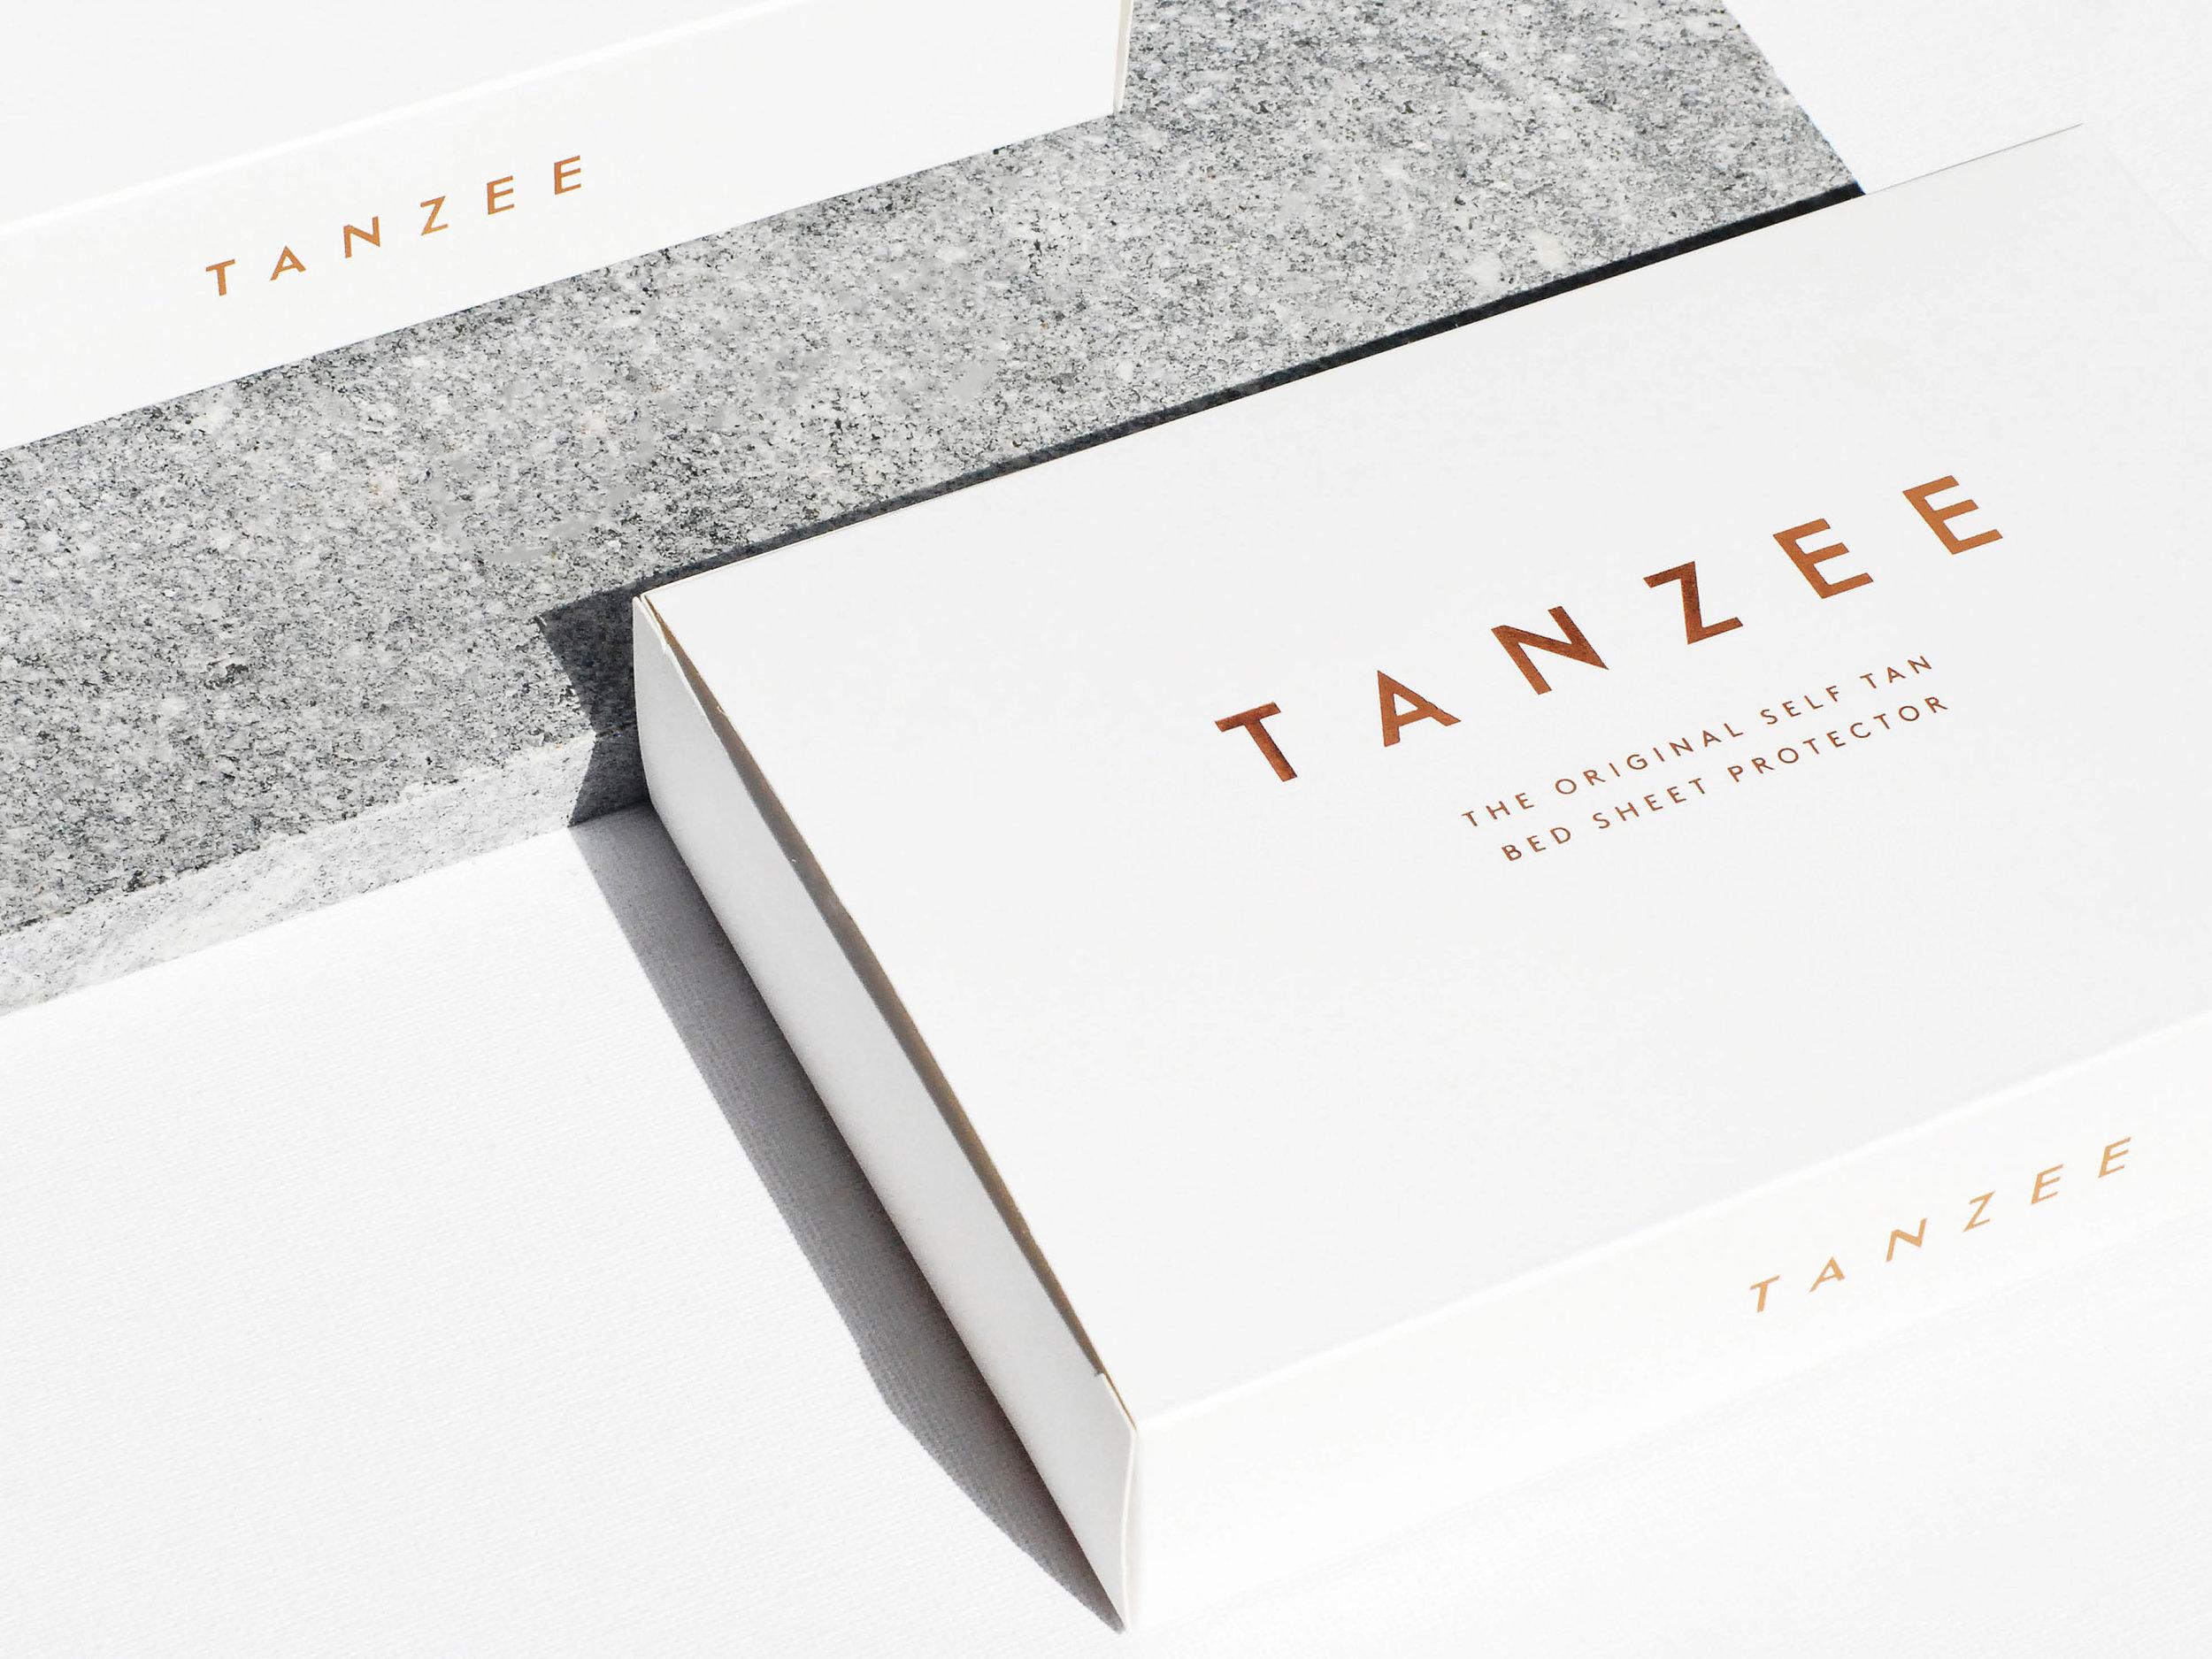 Tanzee_Body_Packaging_Branding_Design_2